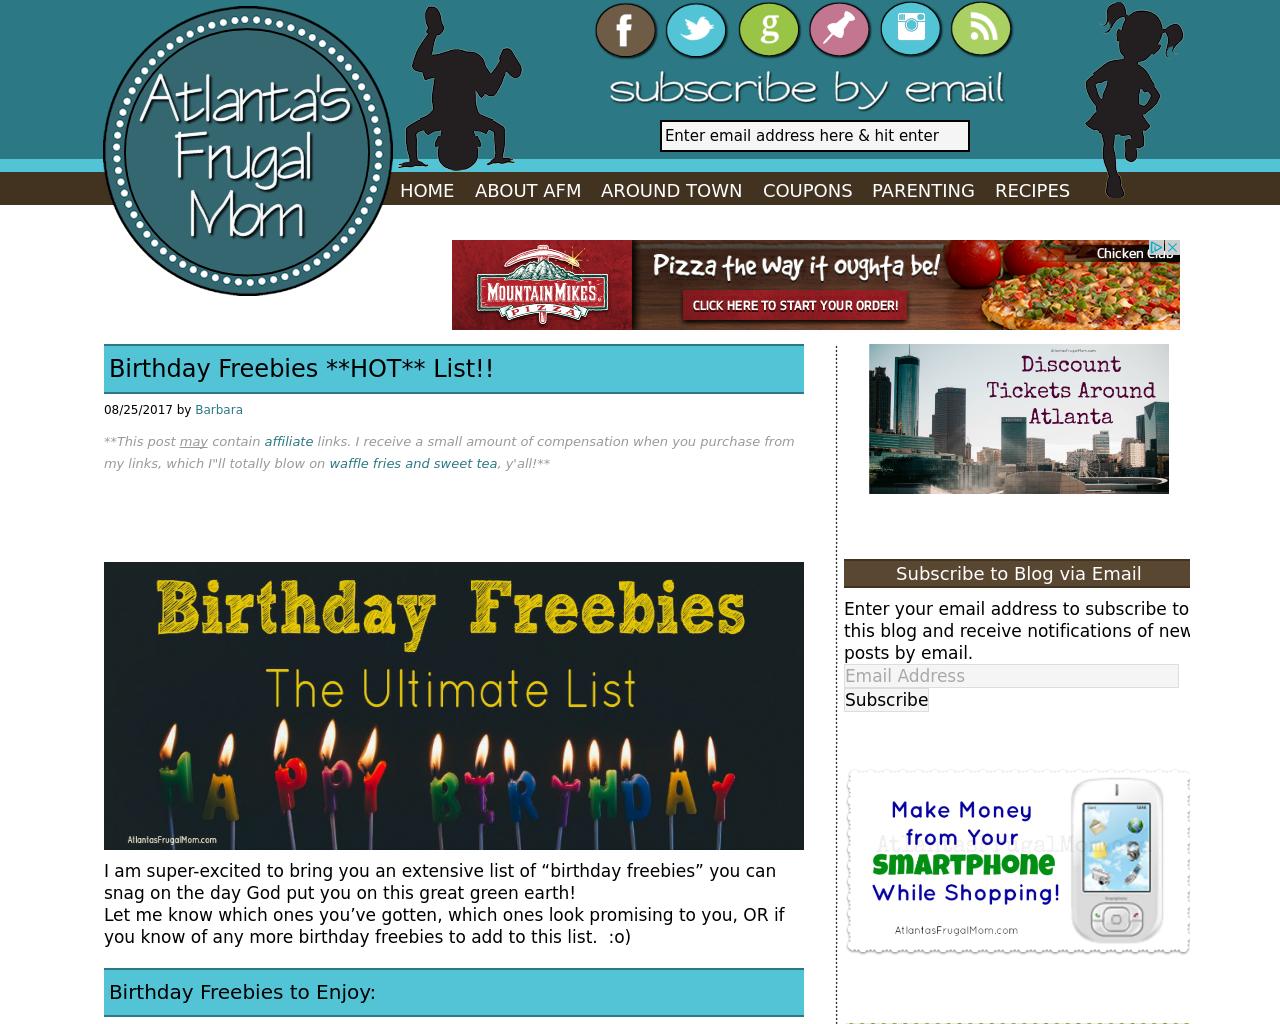 Atlanta's-Frugal-Mom-Advertising-Reviews-Pricing